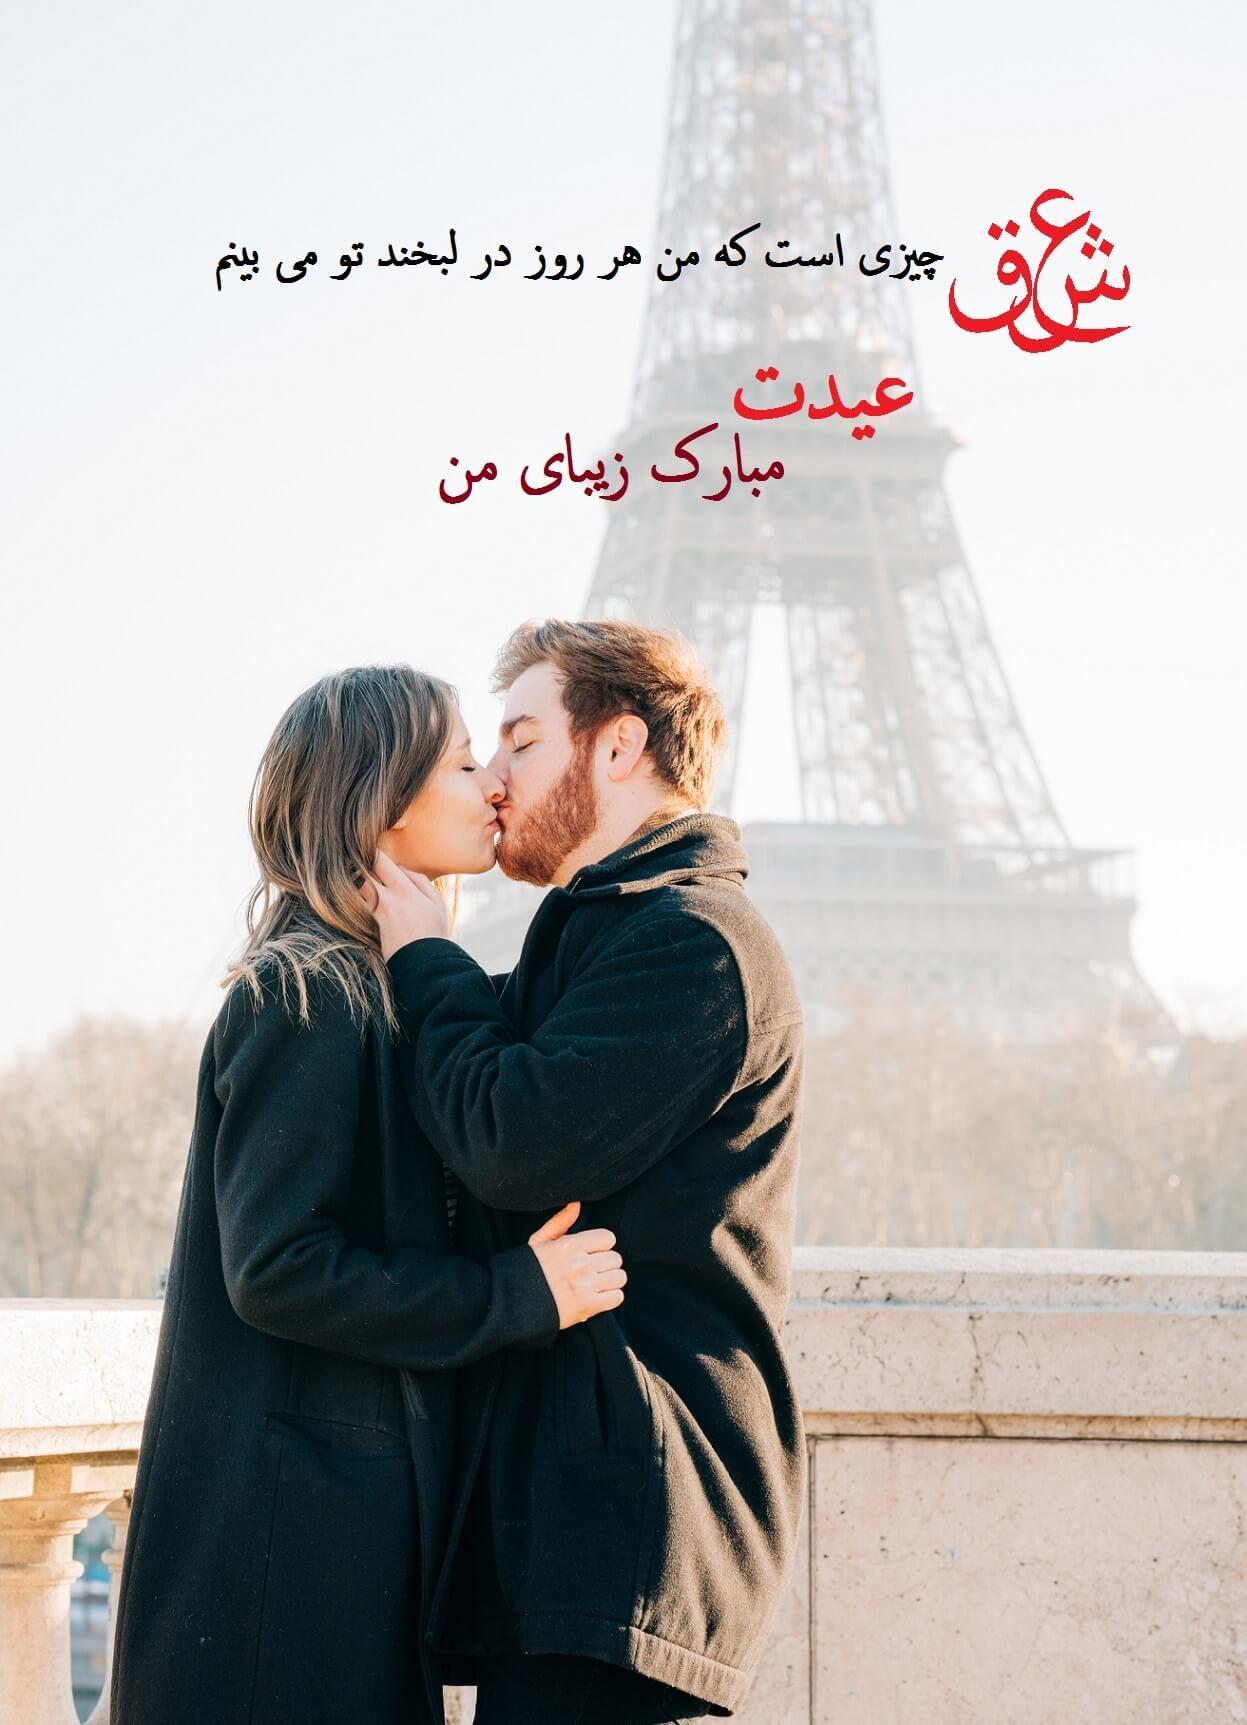 عکس نوشته عاشقانه تبریک عید نوروز به همسر